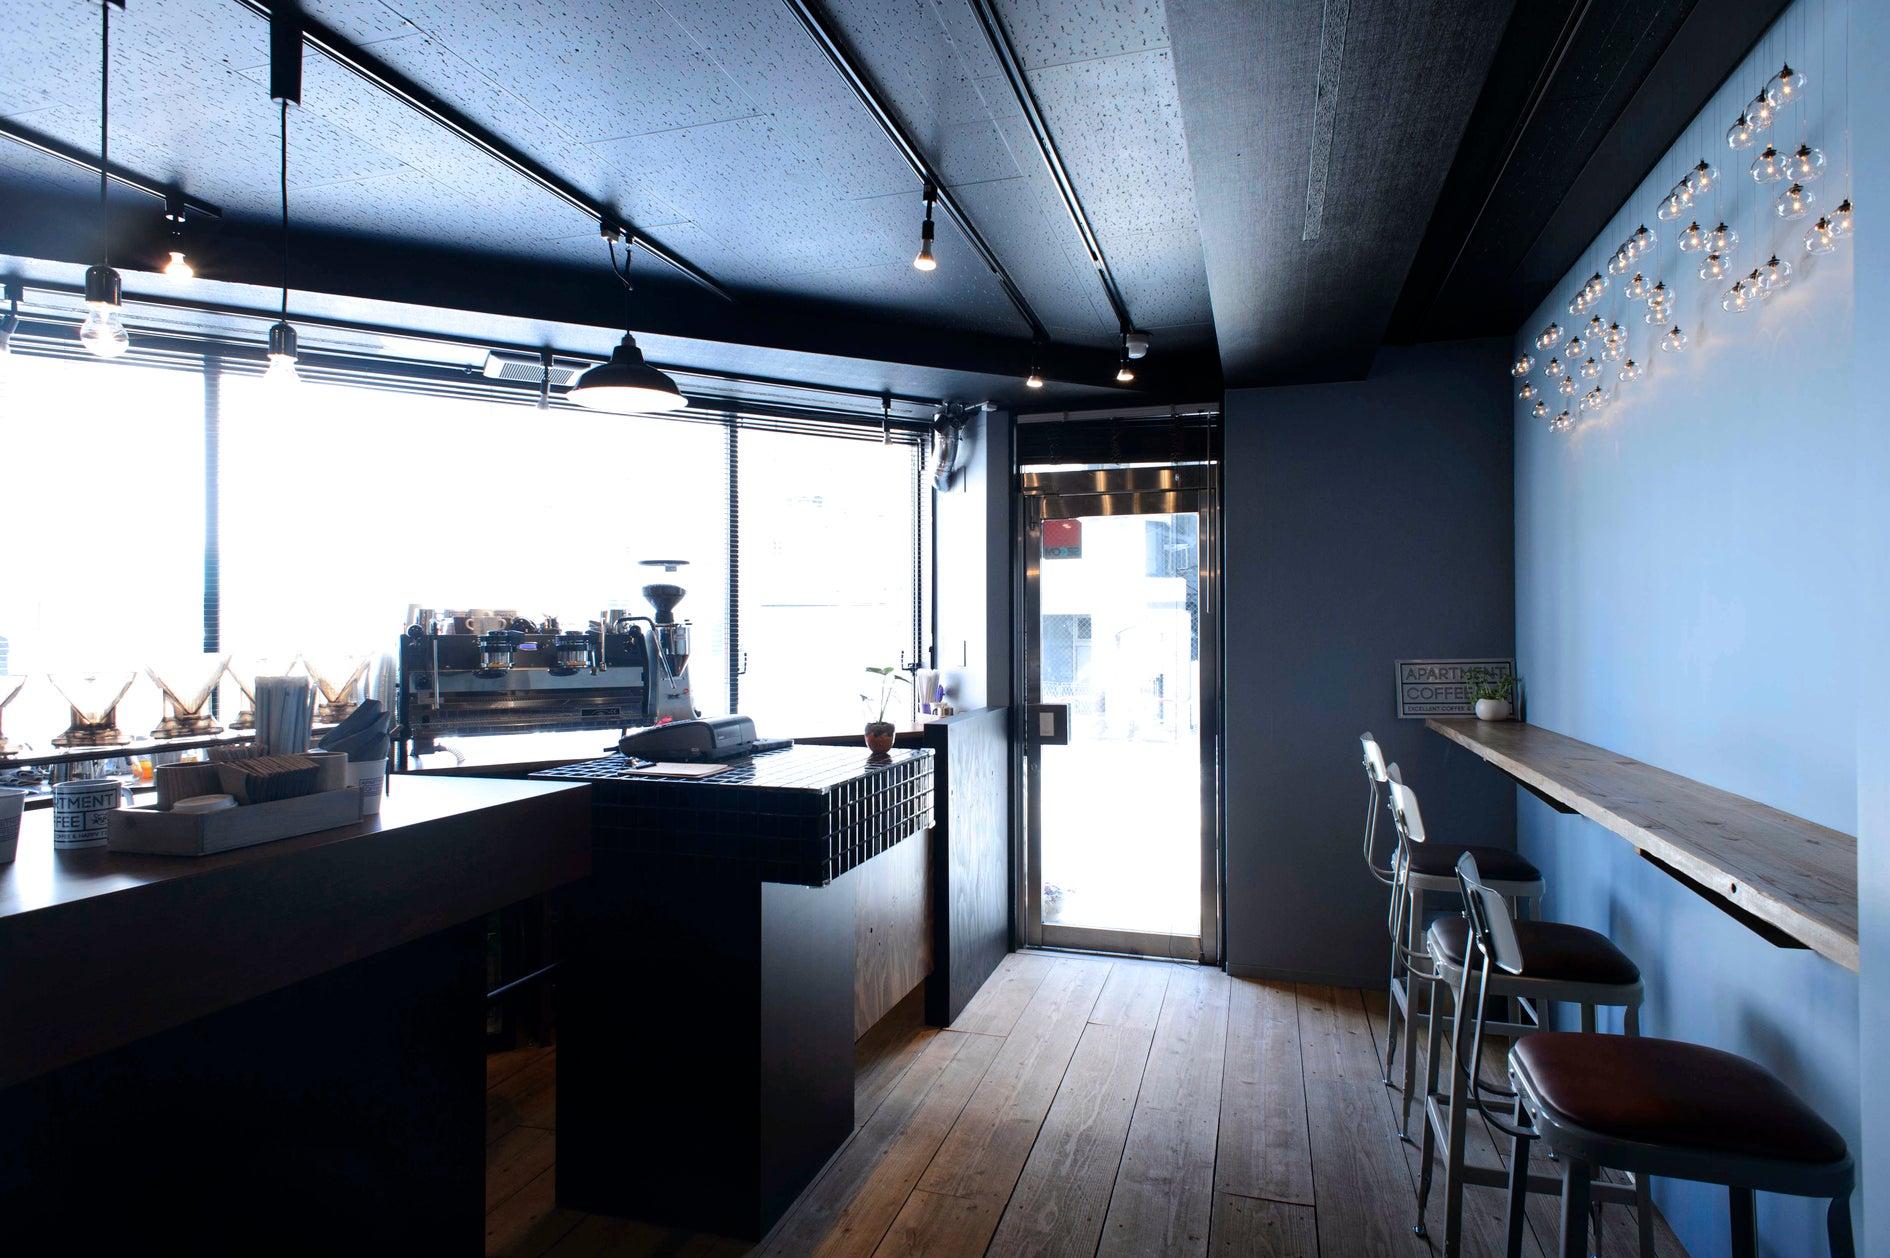 APARTMENT COFFEE (カフェスペース BAR 写真撮影 展示会等々) の写真